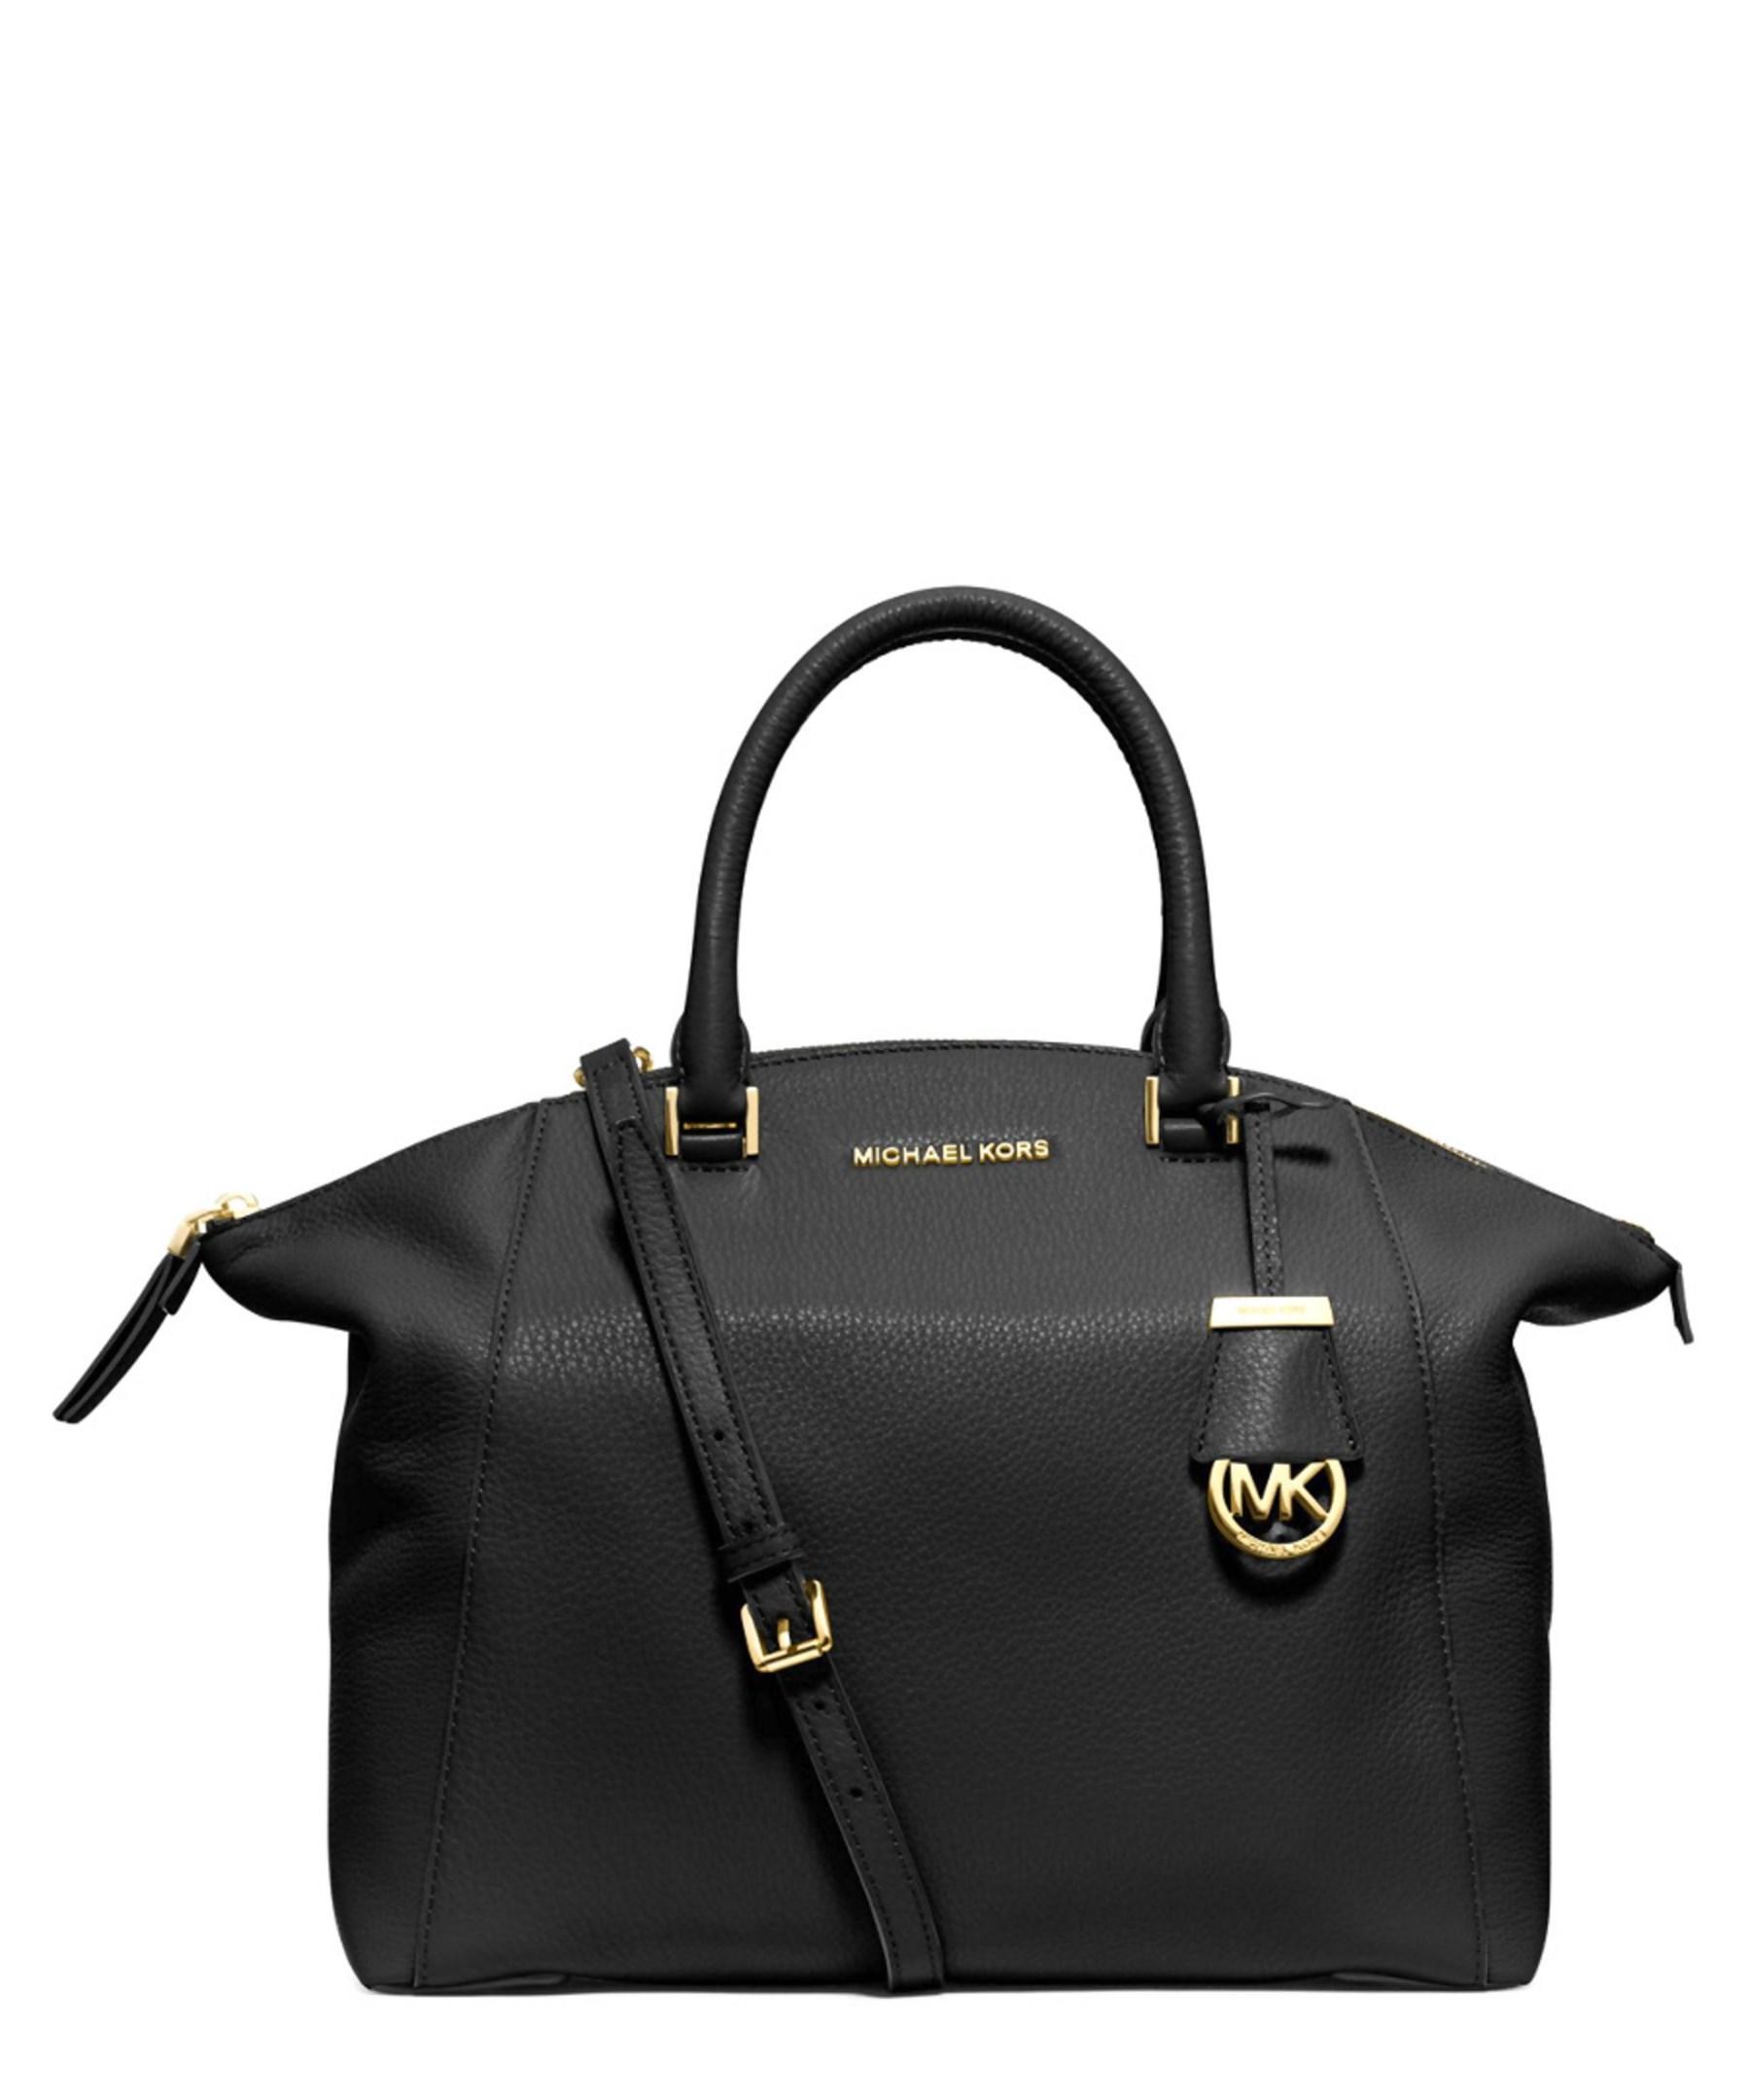 Michael Kors Riley Laukku : Michael kors riley large leather satchel in black